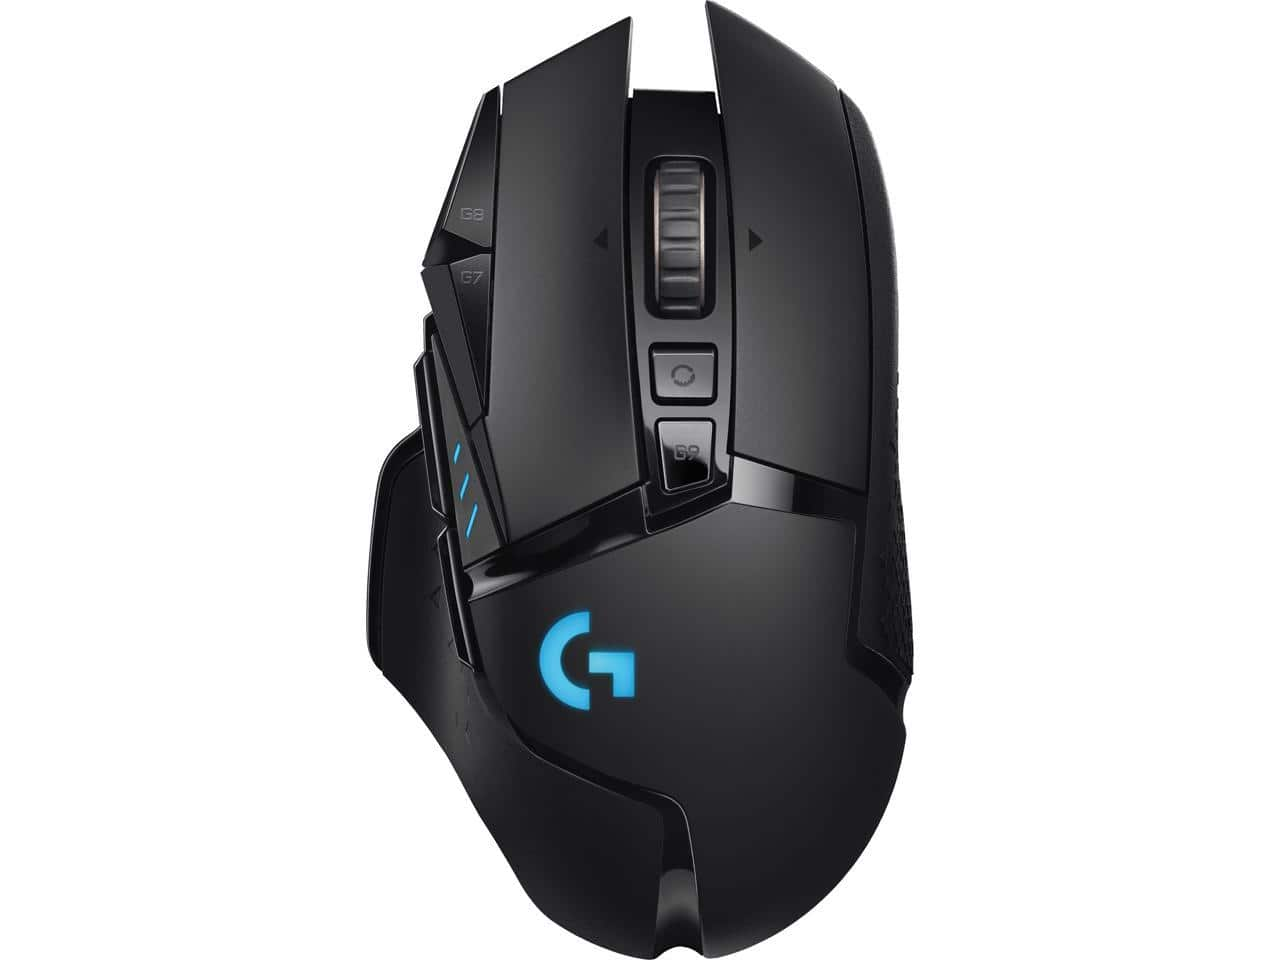 Logitech G502 LIGHTSPEED Wireless Gaming Mouse $95 @Newegg (Amazon also)